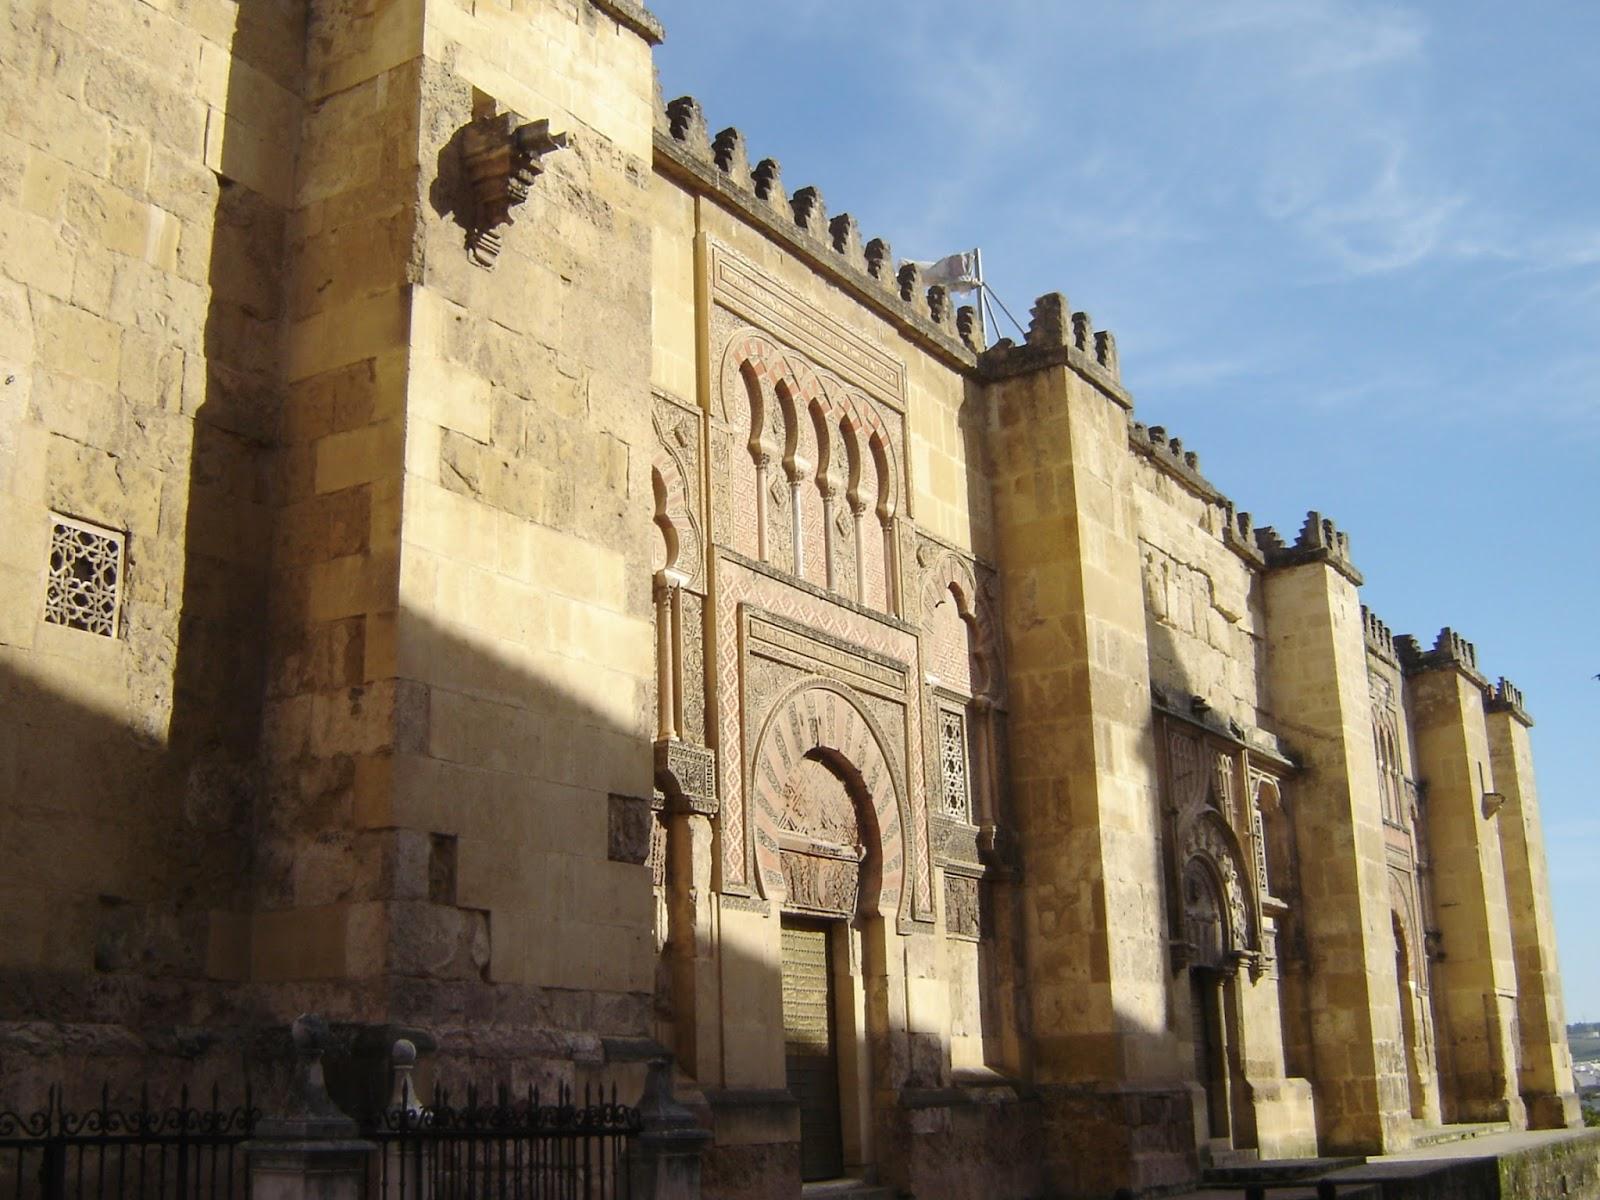 Mezquita catedral de c rdoba spanish impressions - Mezquita de cordoba de noche ...